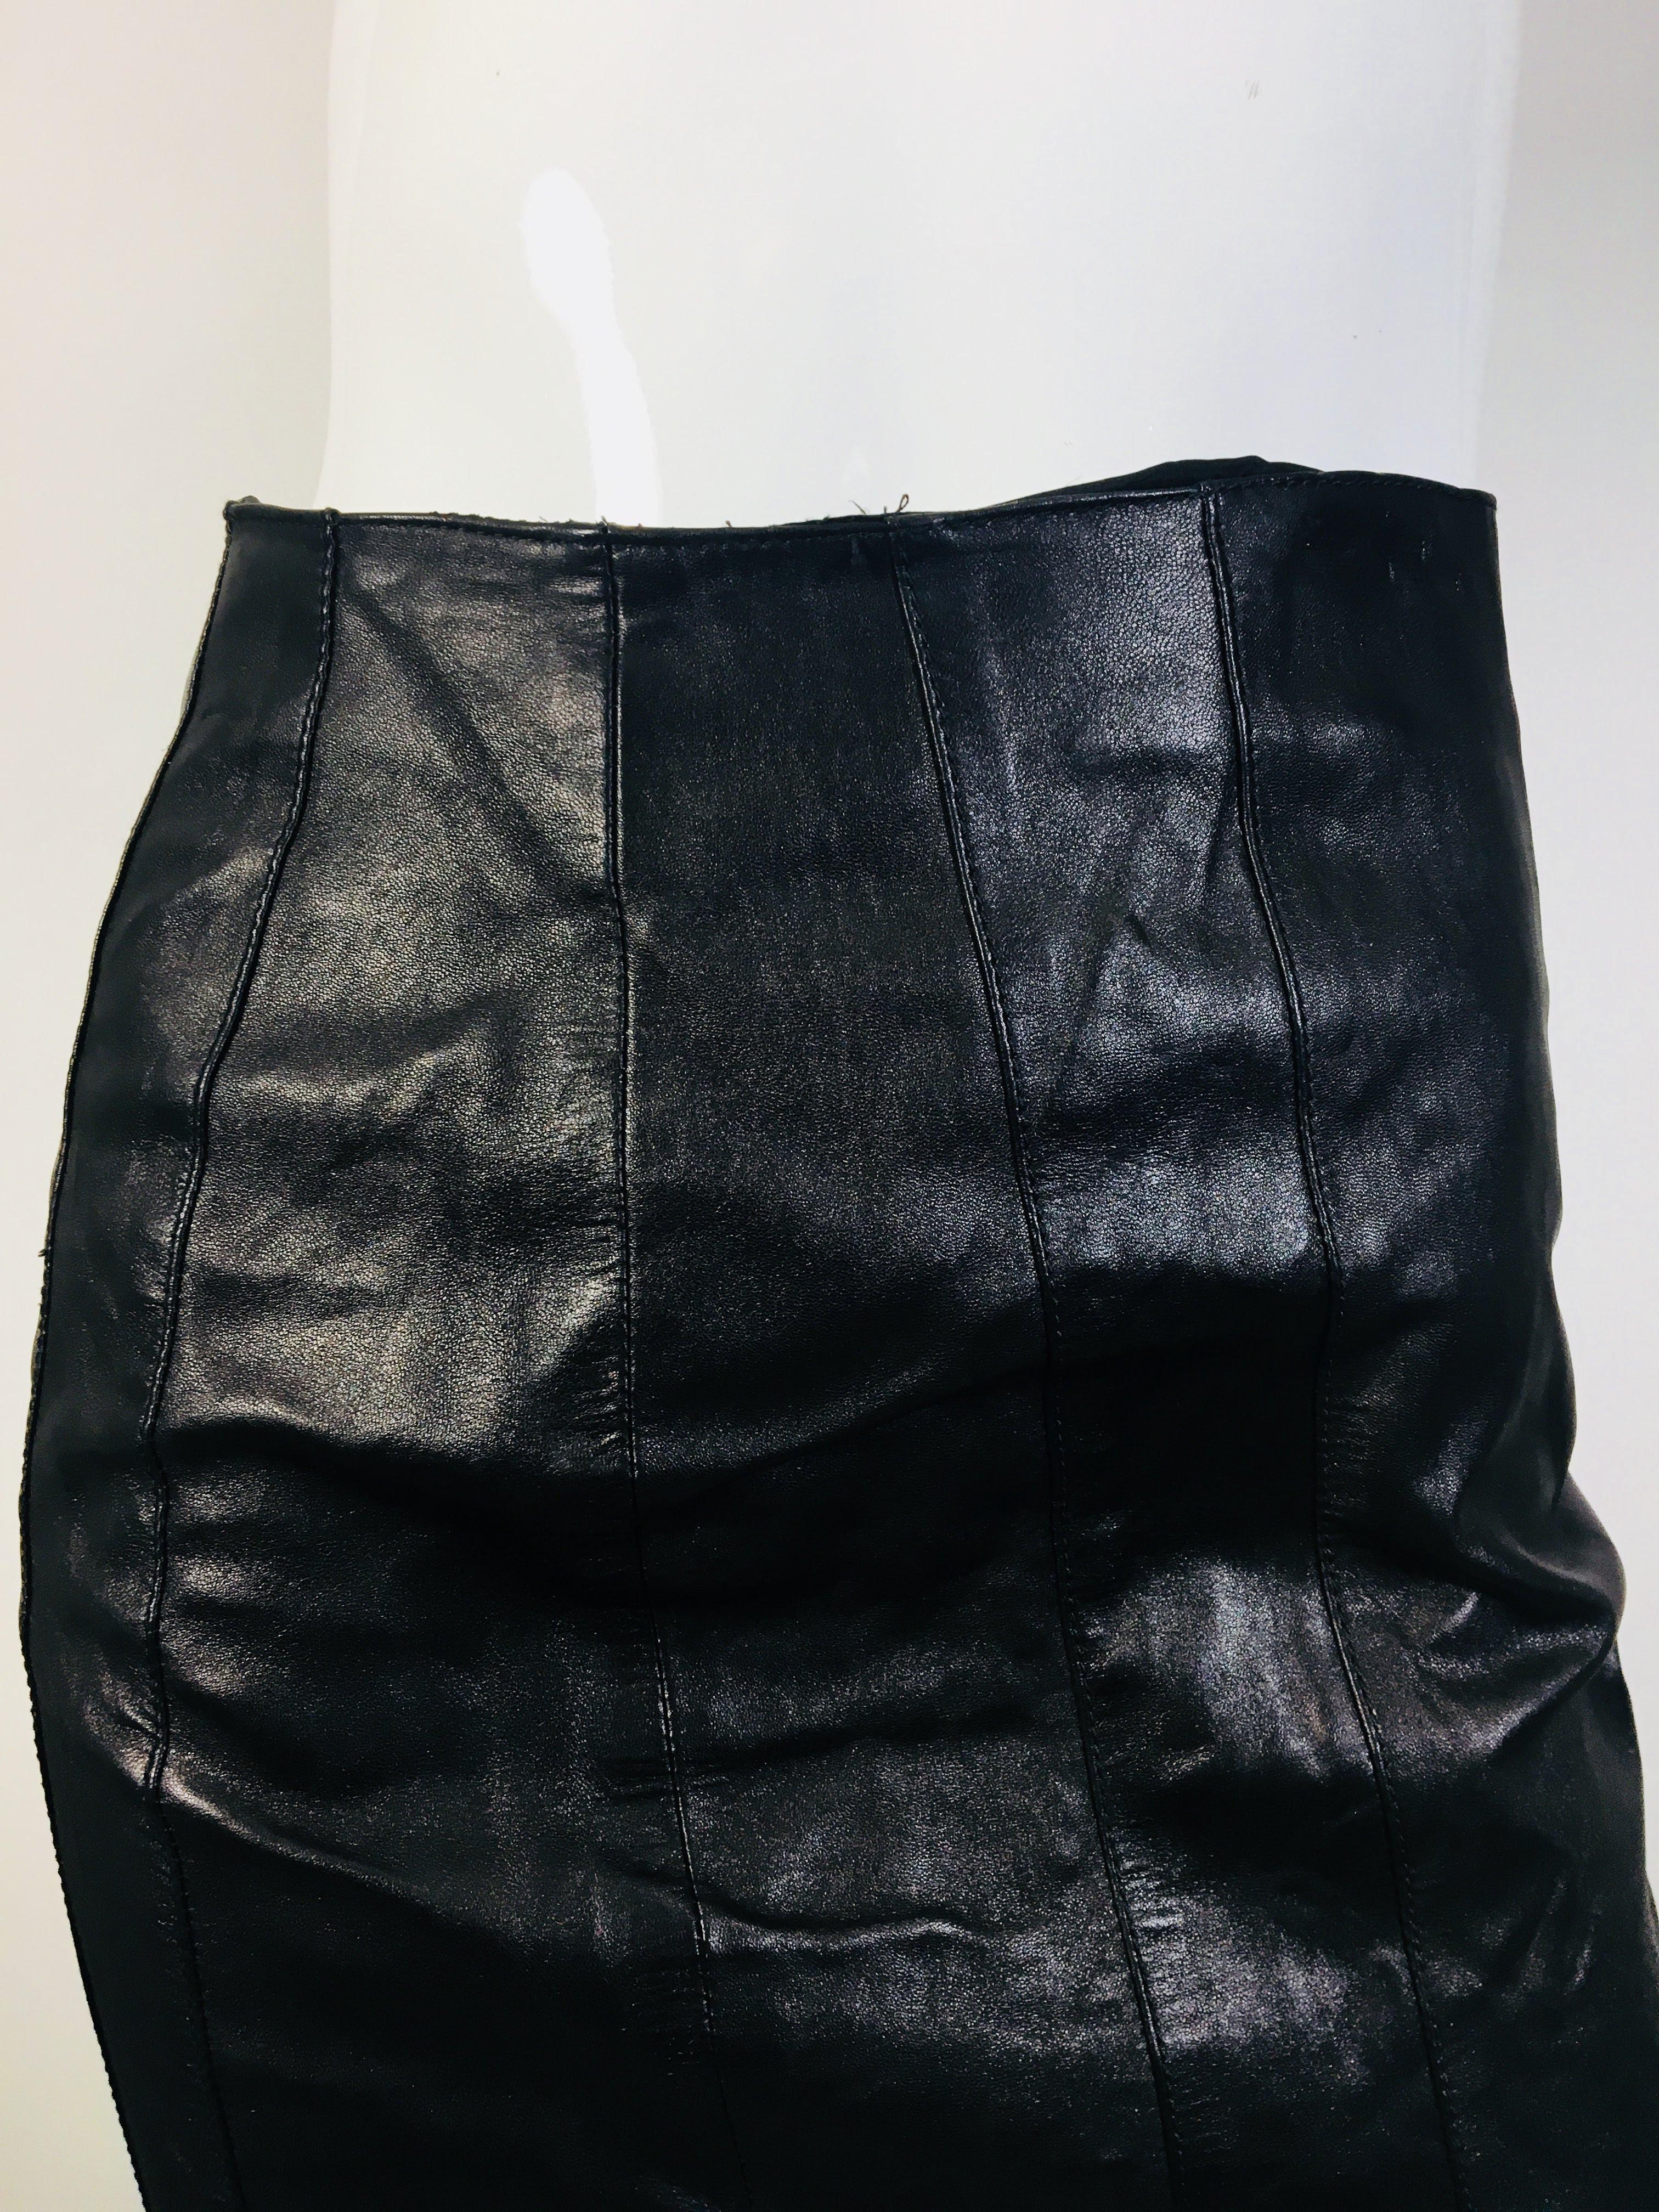 38afba4c38 Details about Prada Size 40 Women's Black Leather Pencil Skirt